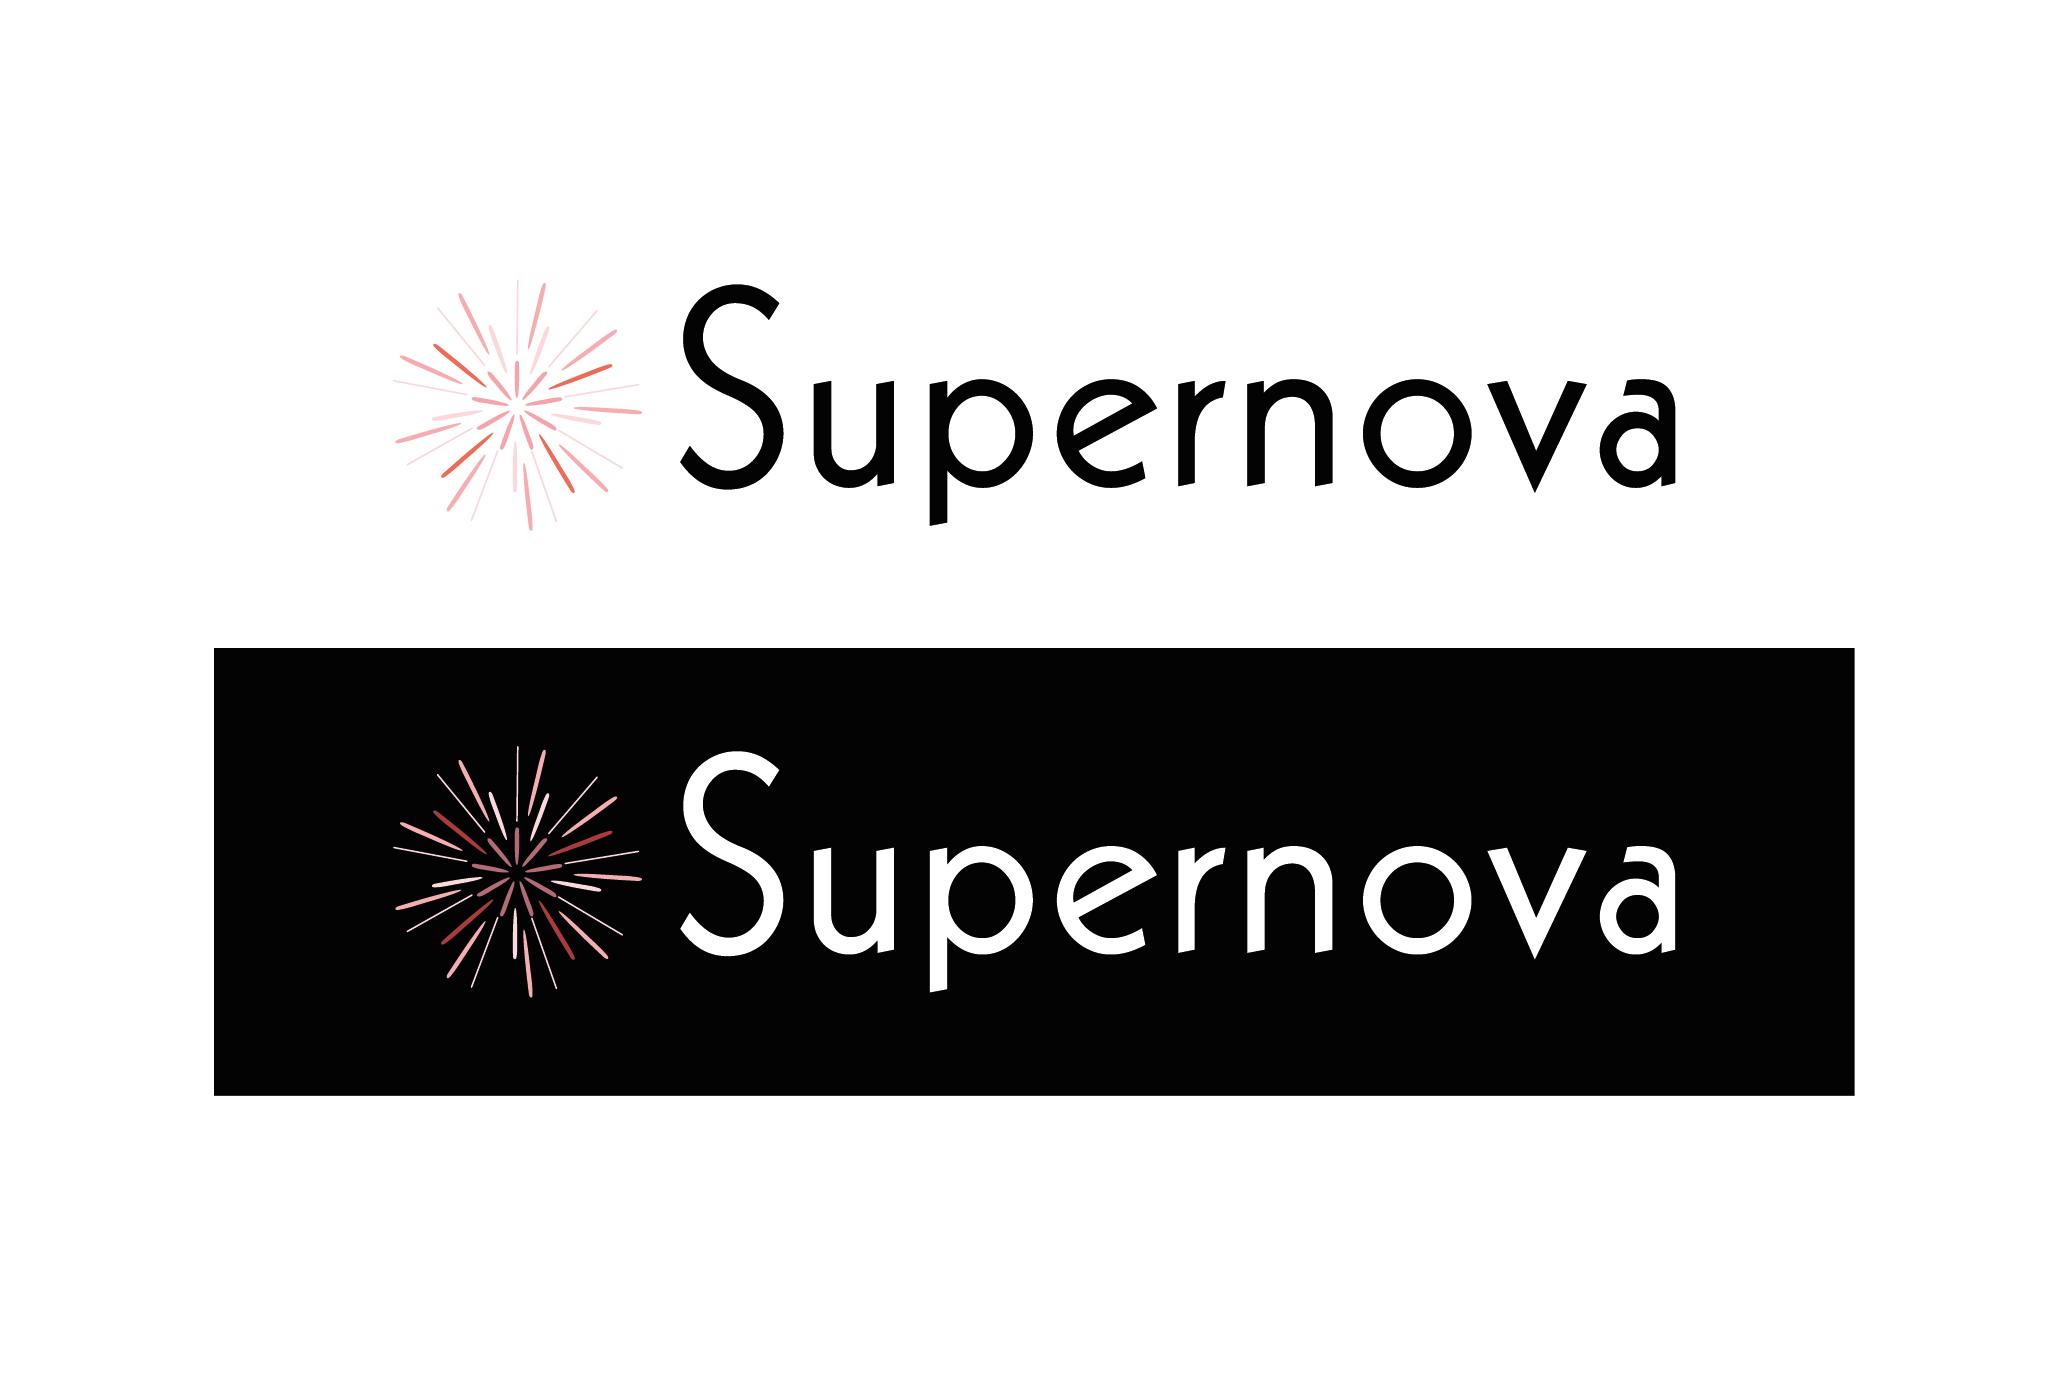 Logo Design by Florian Lagadic - Entry No. 256 in the Logo Design Contest Creative Logo Design for Supernova.